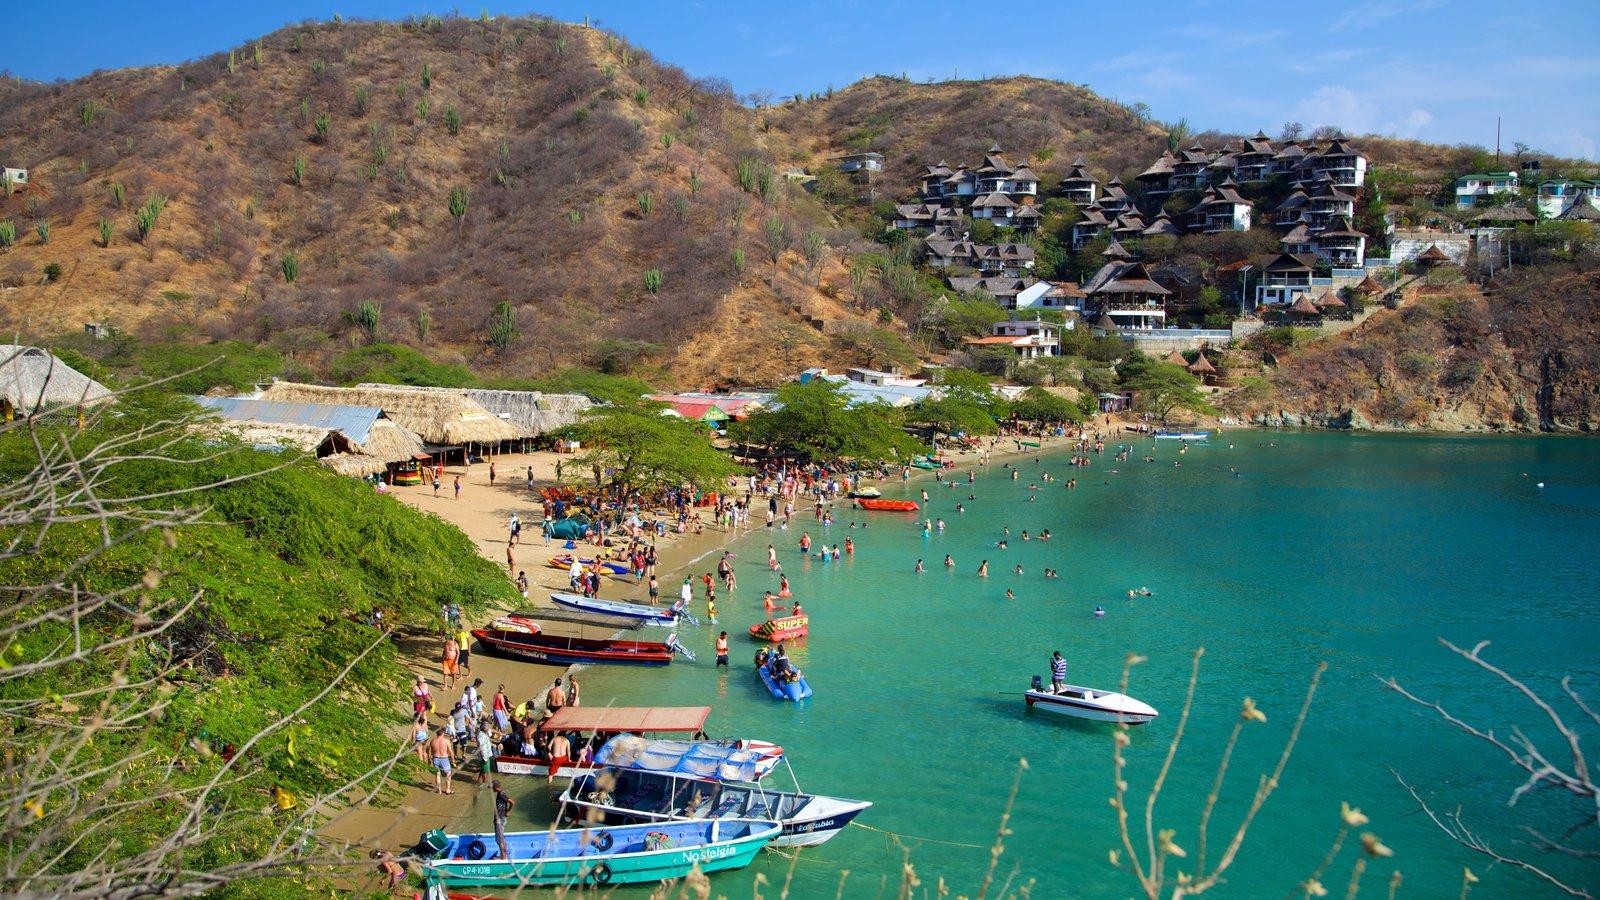 Taganga Beach showing a bay or harbor, a coastal town and a sandy beach